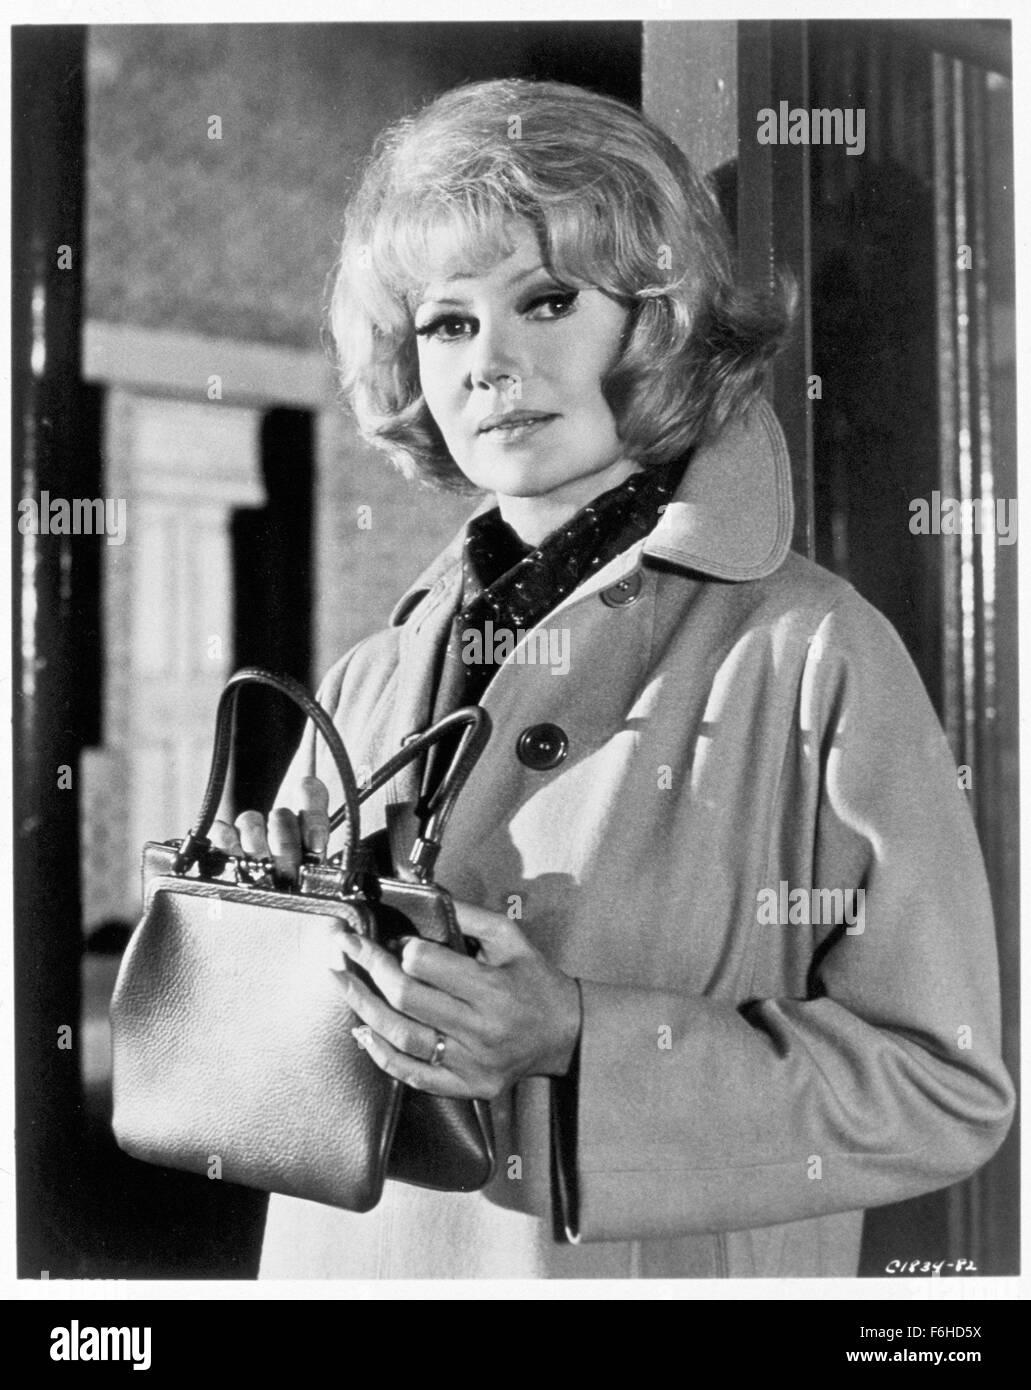 1966, Film Title: MONEY TRAP, Director: BURT KENNEDY, Studio: MGM, Pictured: RITA HAYWORTH. (Credit Image: SNAP) - Stock Image